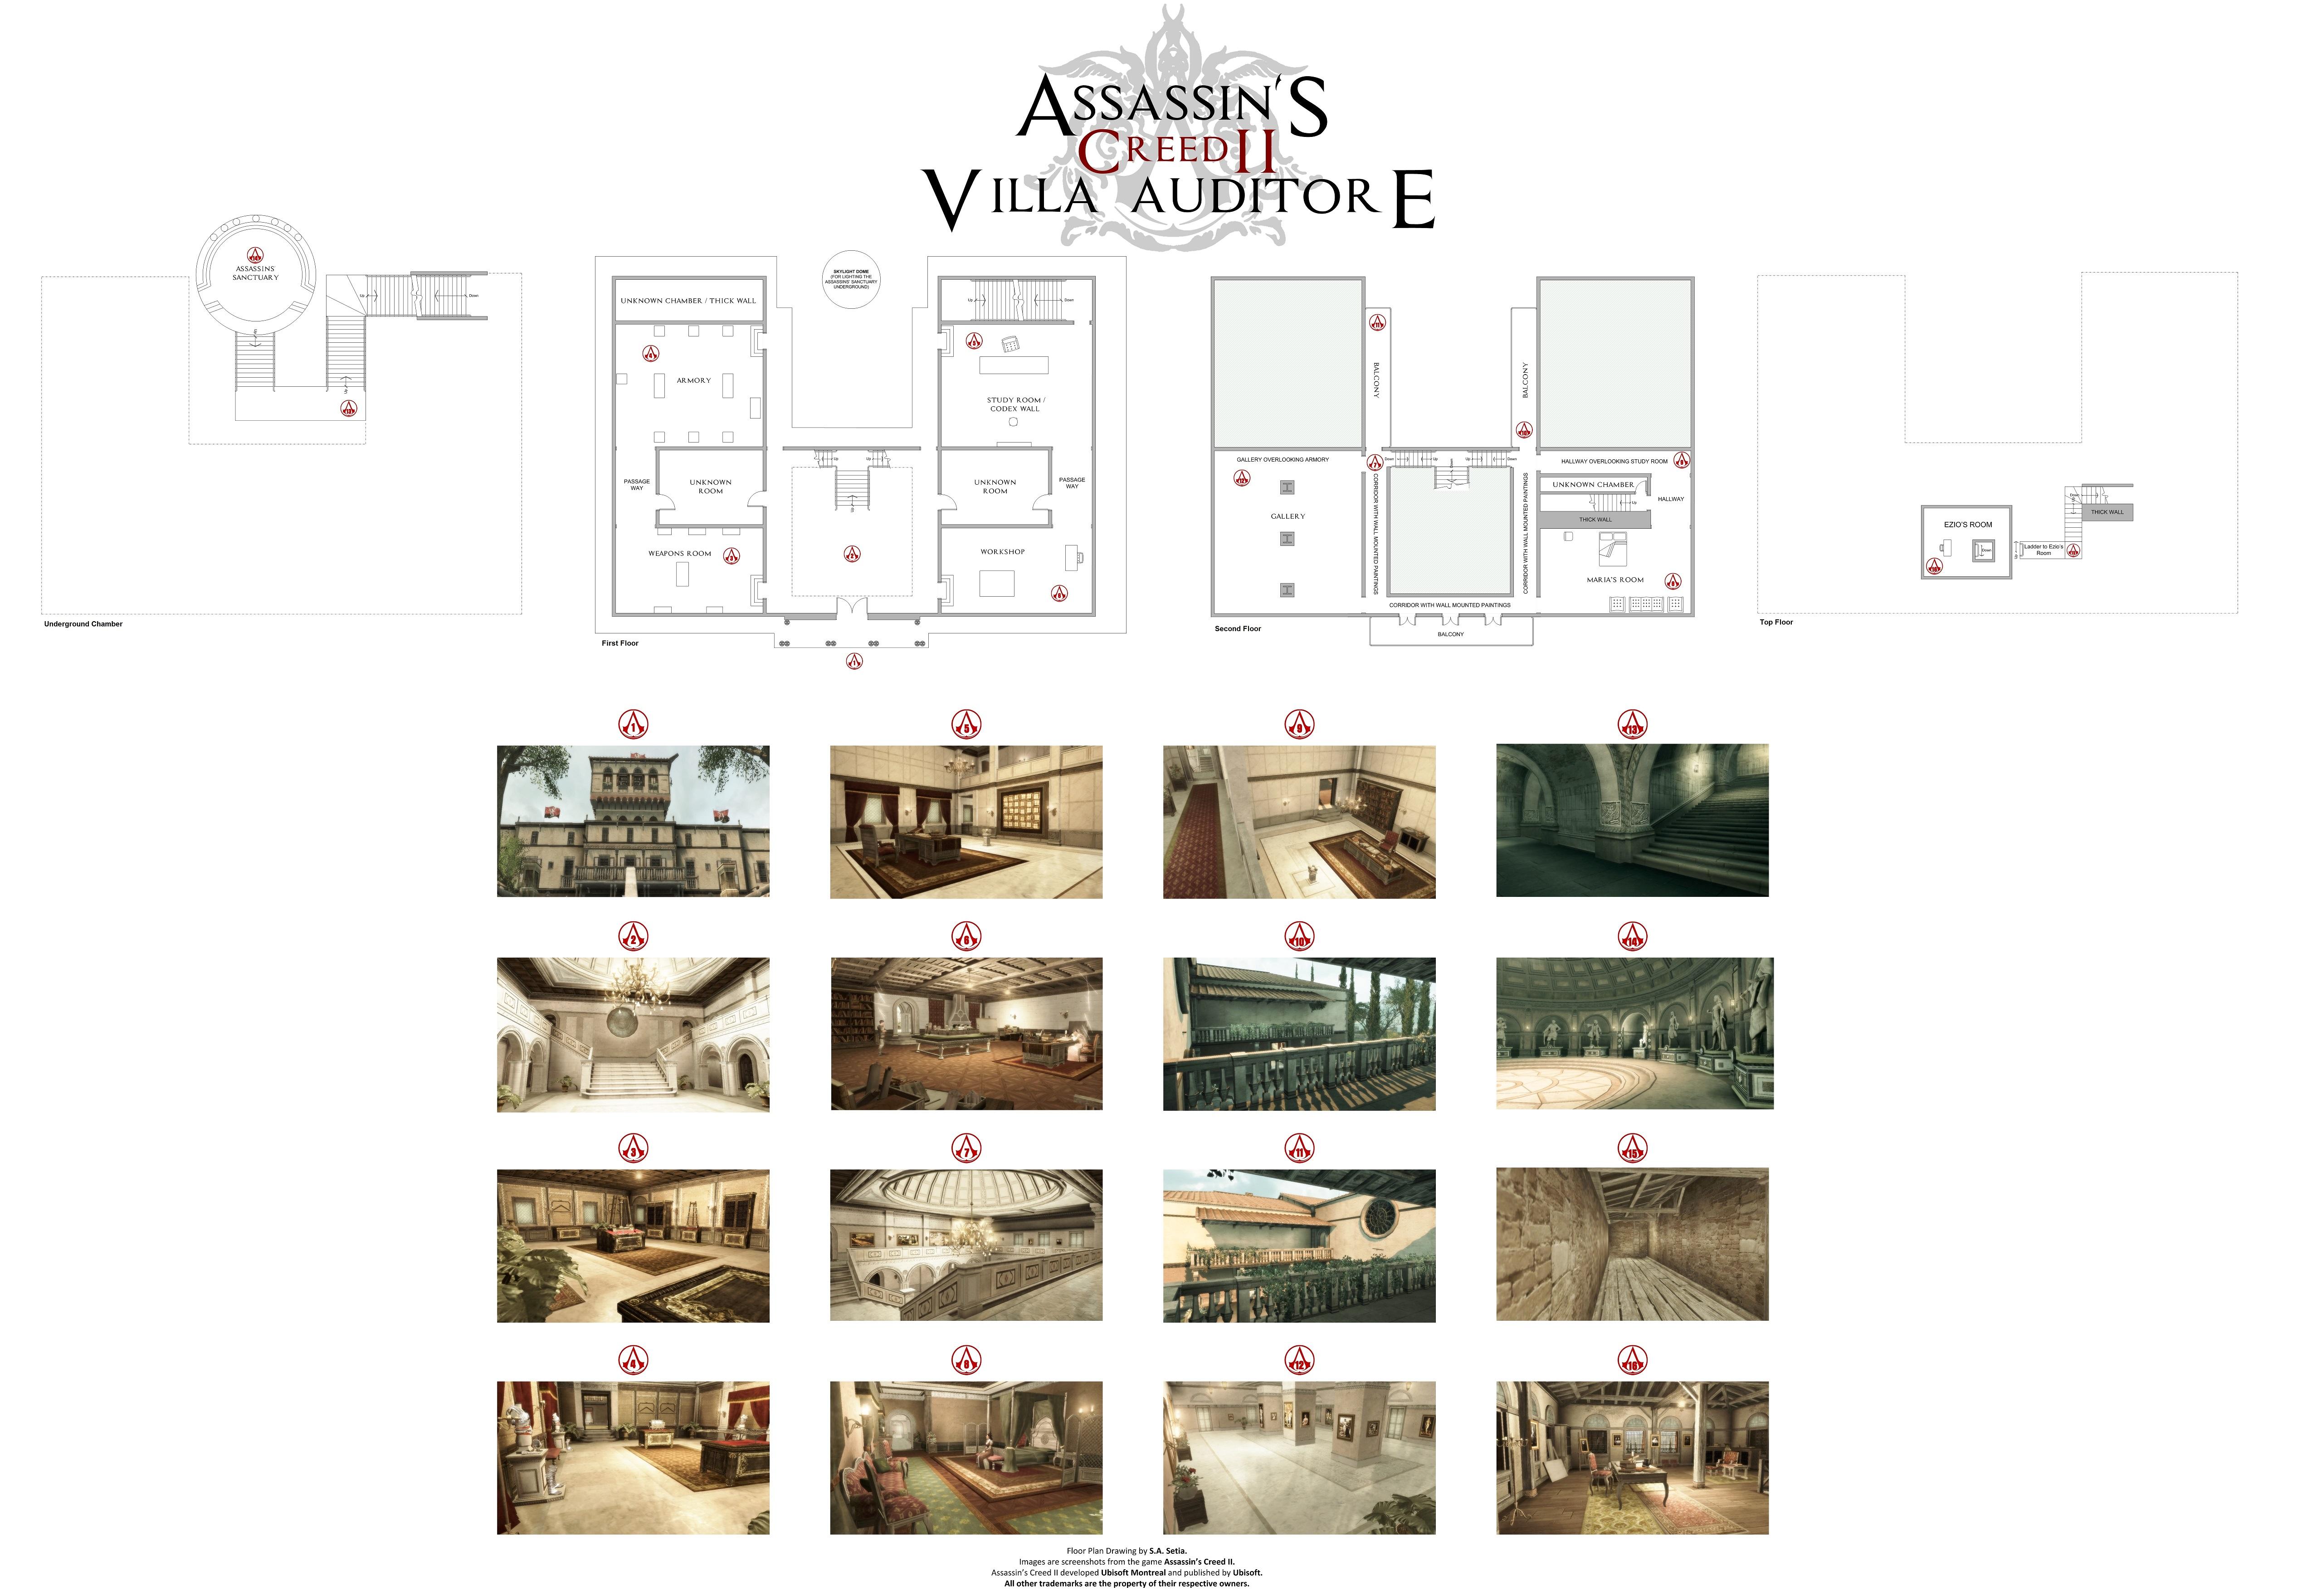 Assassin's Creed II - Villa Auditore Floor Plan by